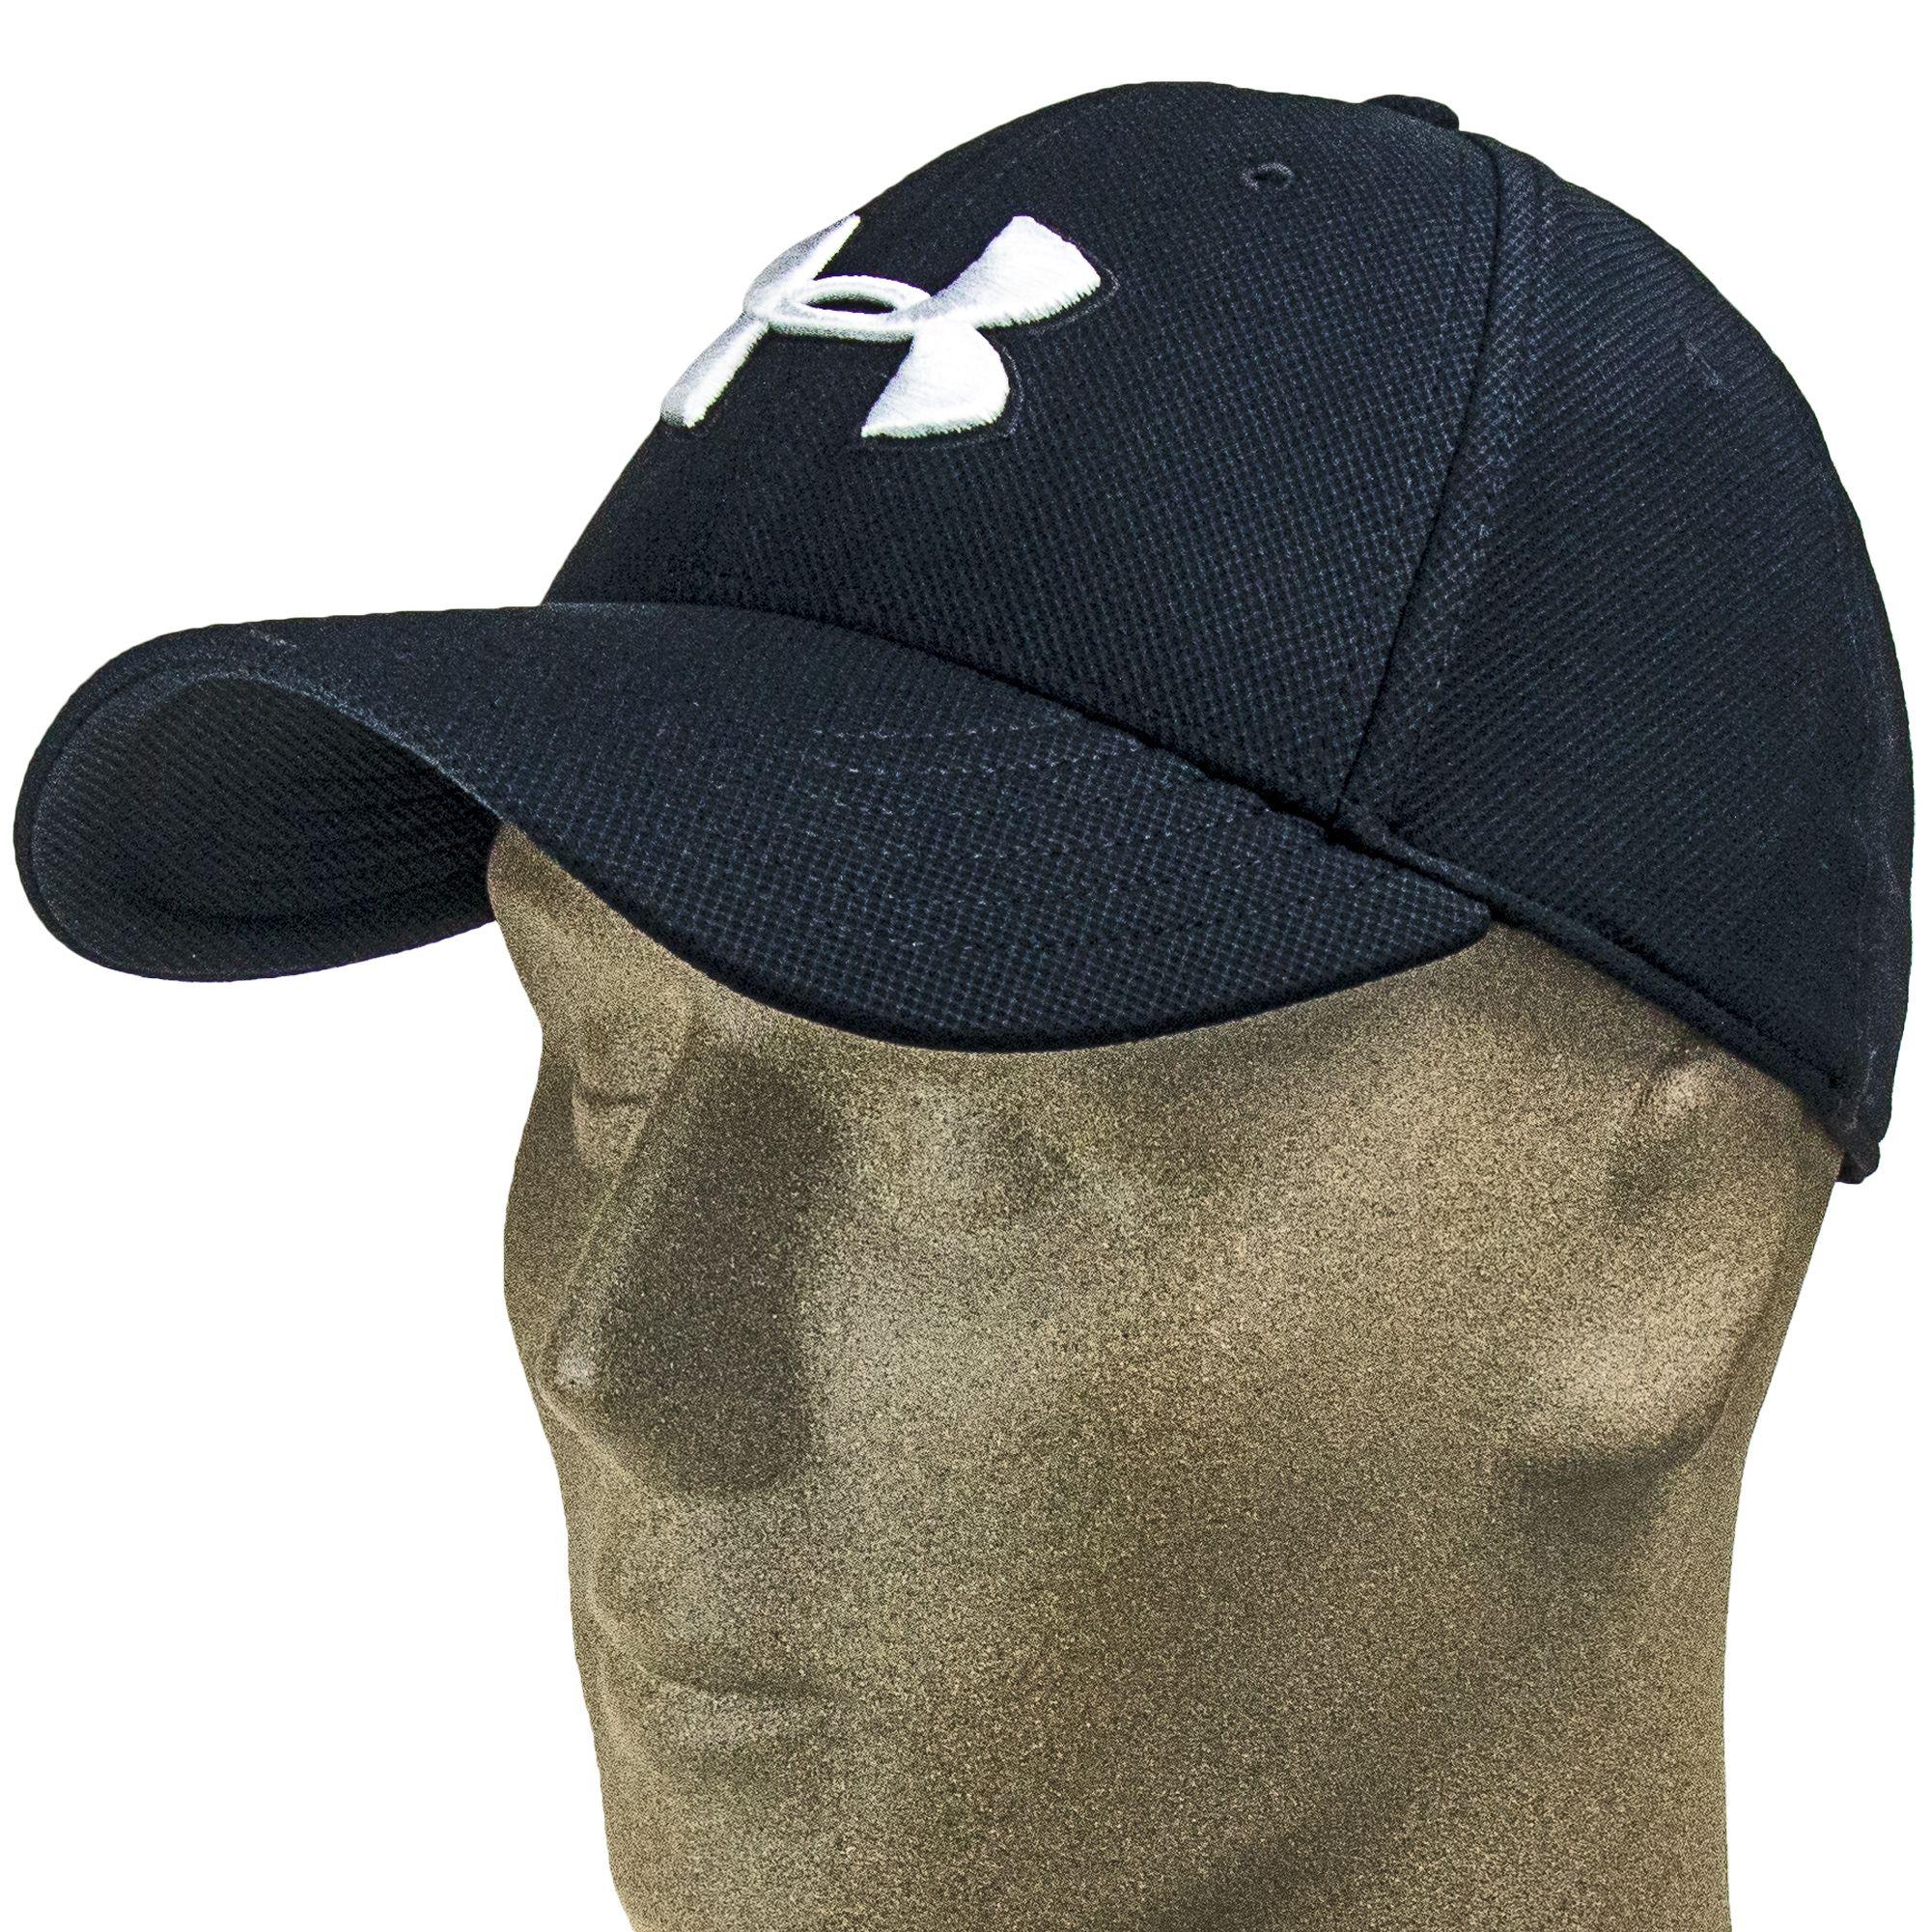 df4b30a010d6ab Under Armour Hats: Men's Black 1305036 001 Blitzing 3.0 Cap ...